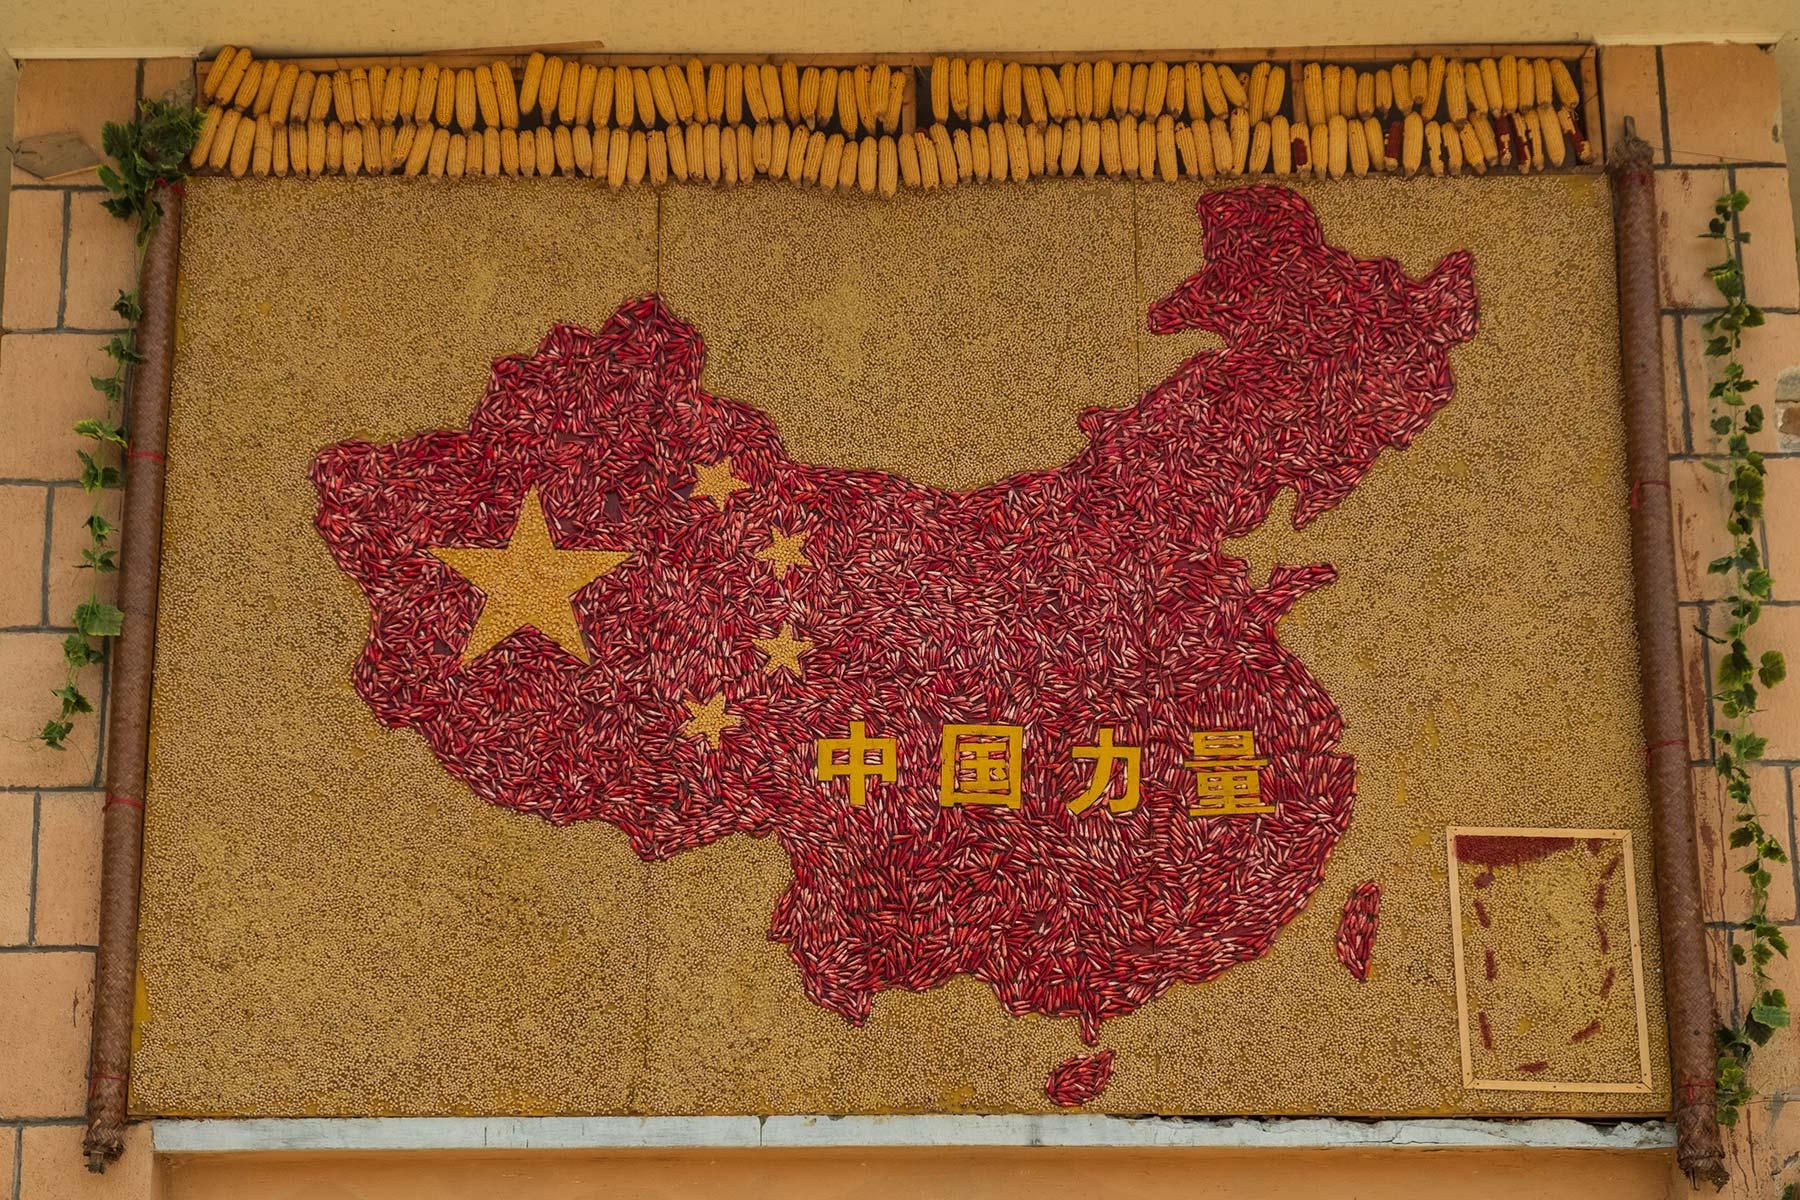 China Propaganda in Yangchan Tulou 阳产土楼 Erdhäuser Dorf in Anhui